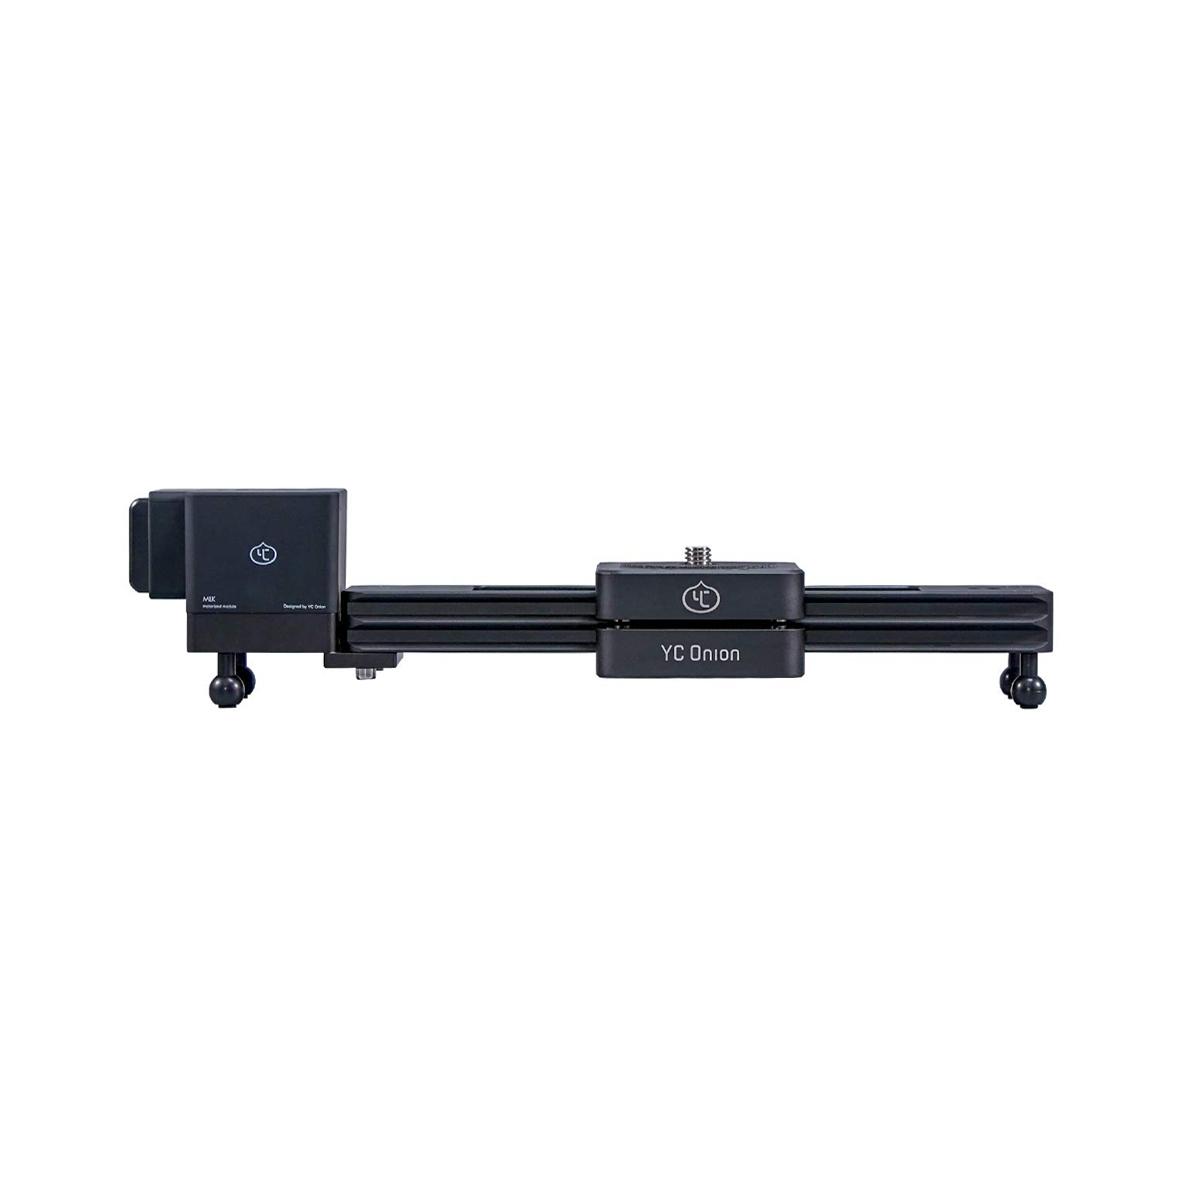 YC Onion CHOCOLATE Motorized Camera Slider